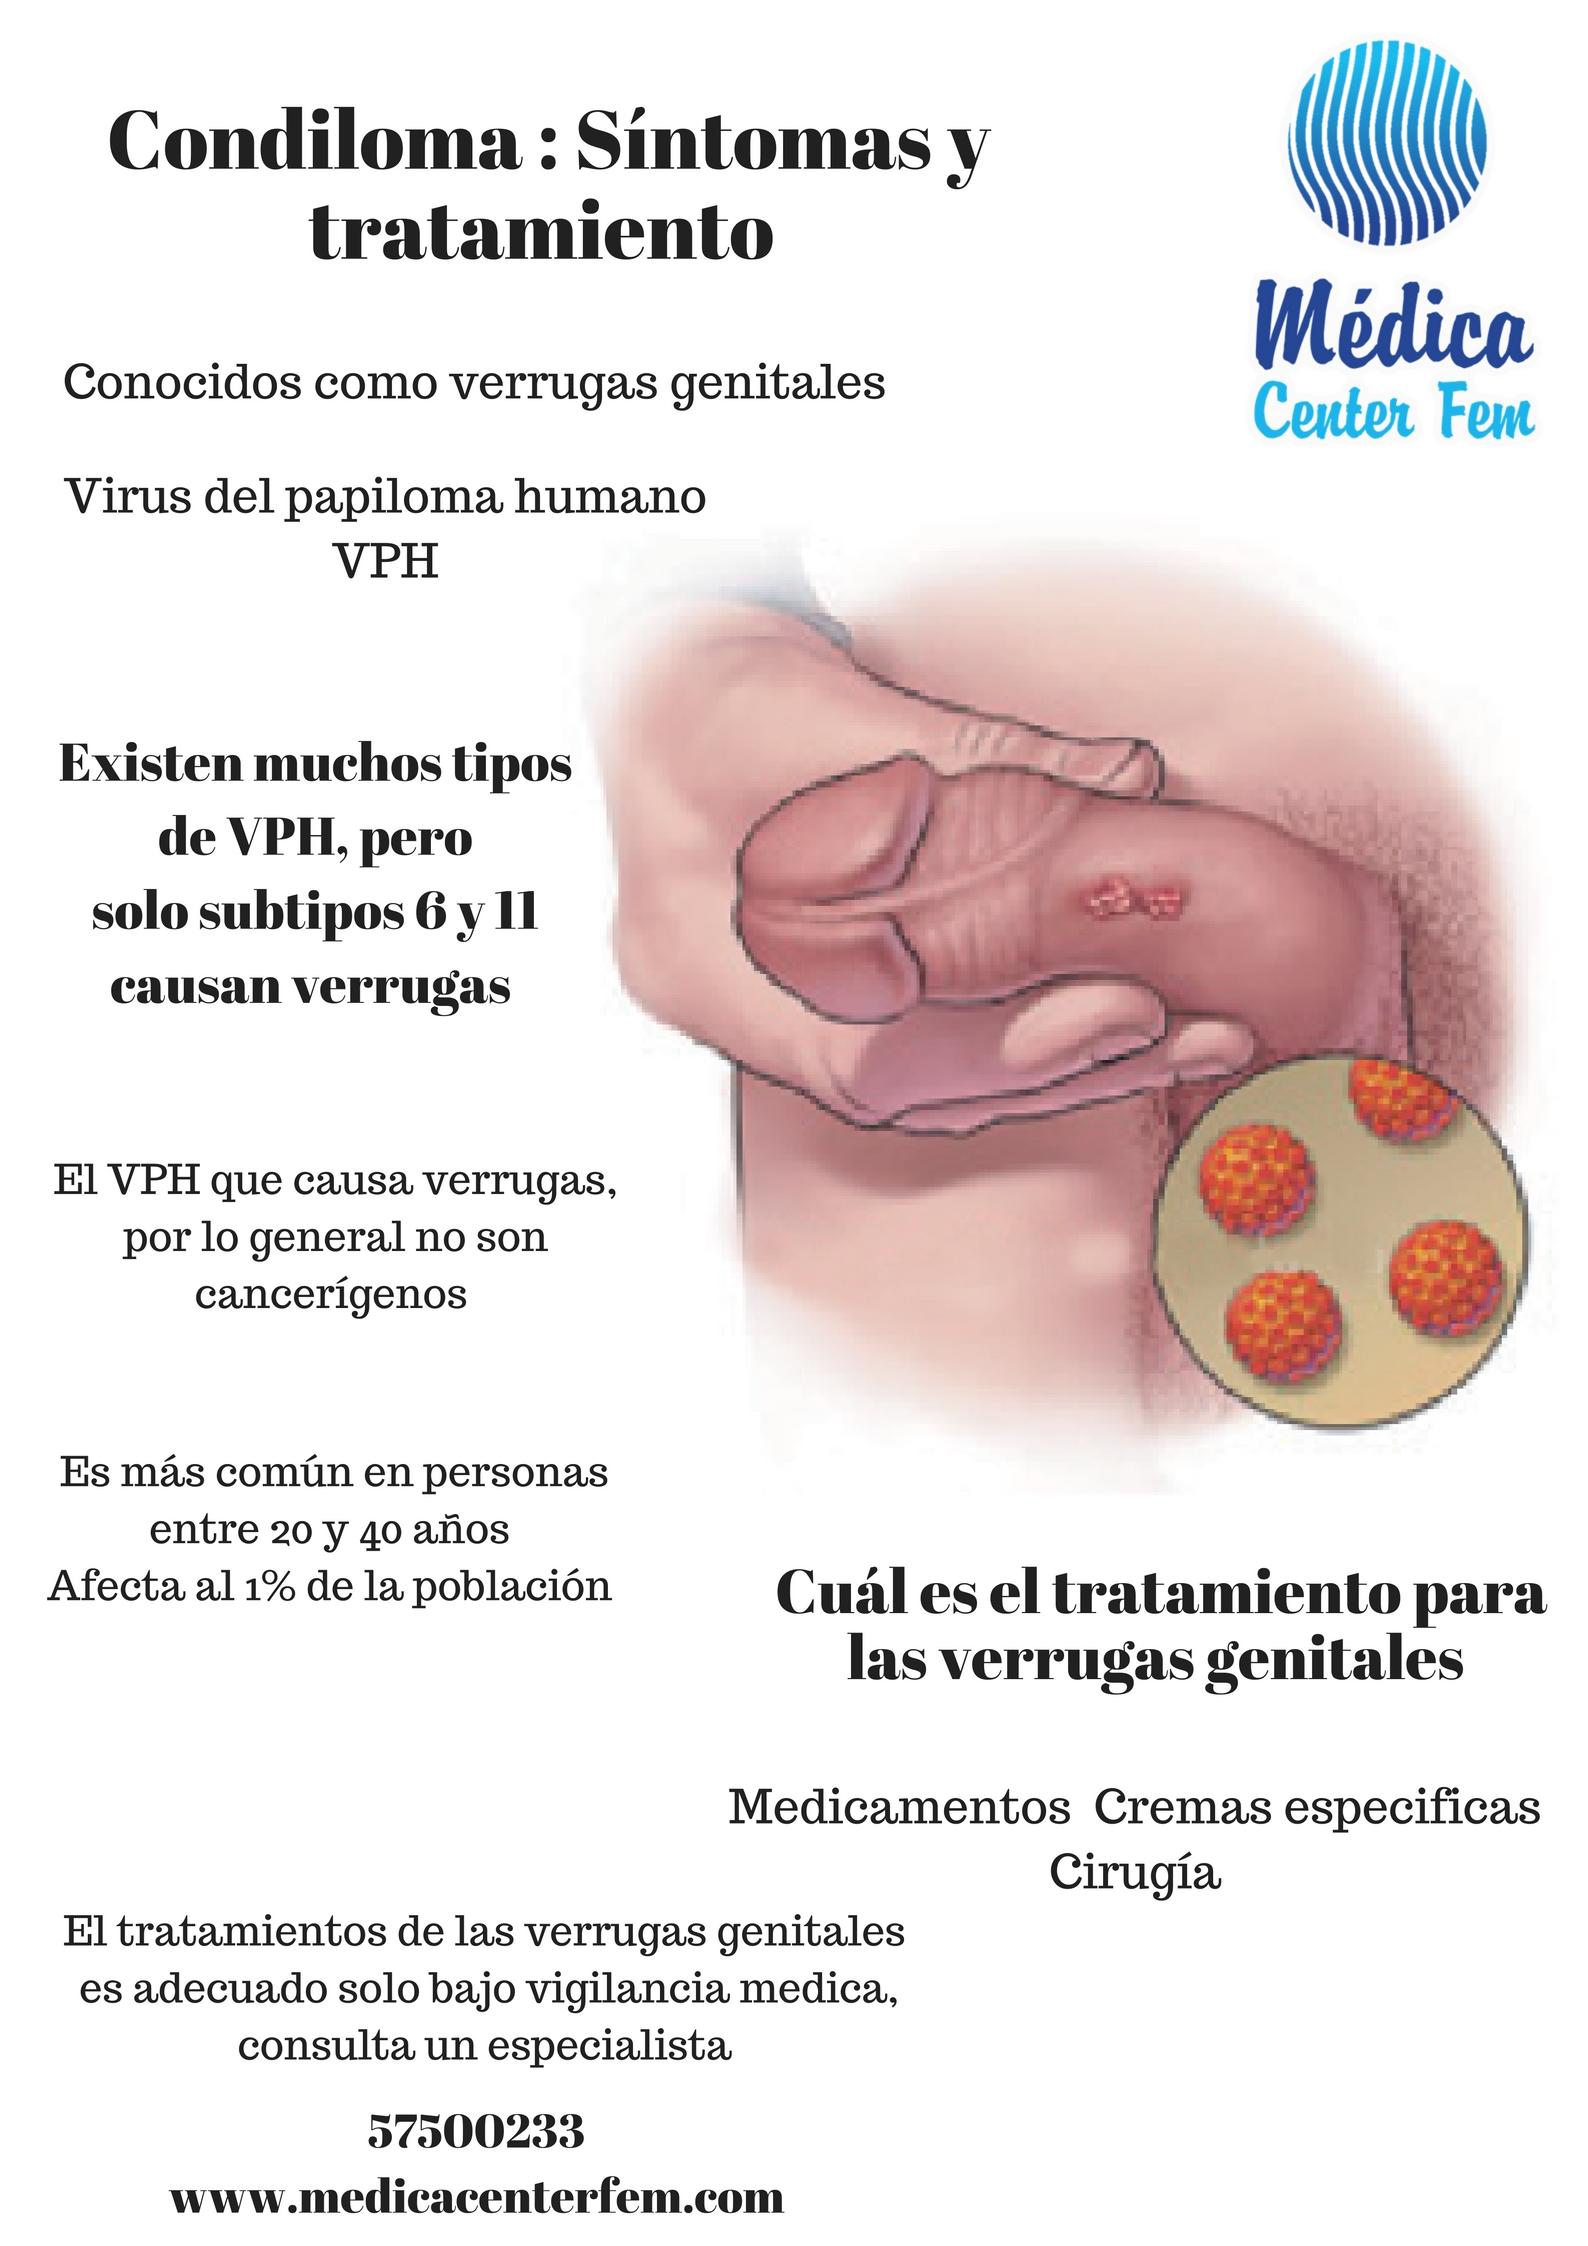 virus del papiloma humano en mujeres sintomas y tratamiento papillomavirus homme